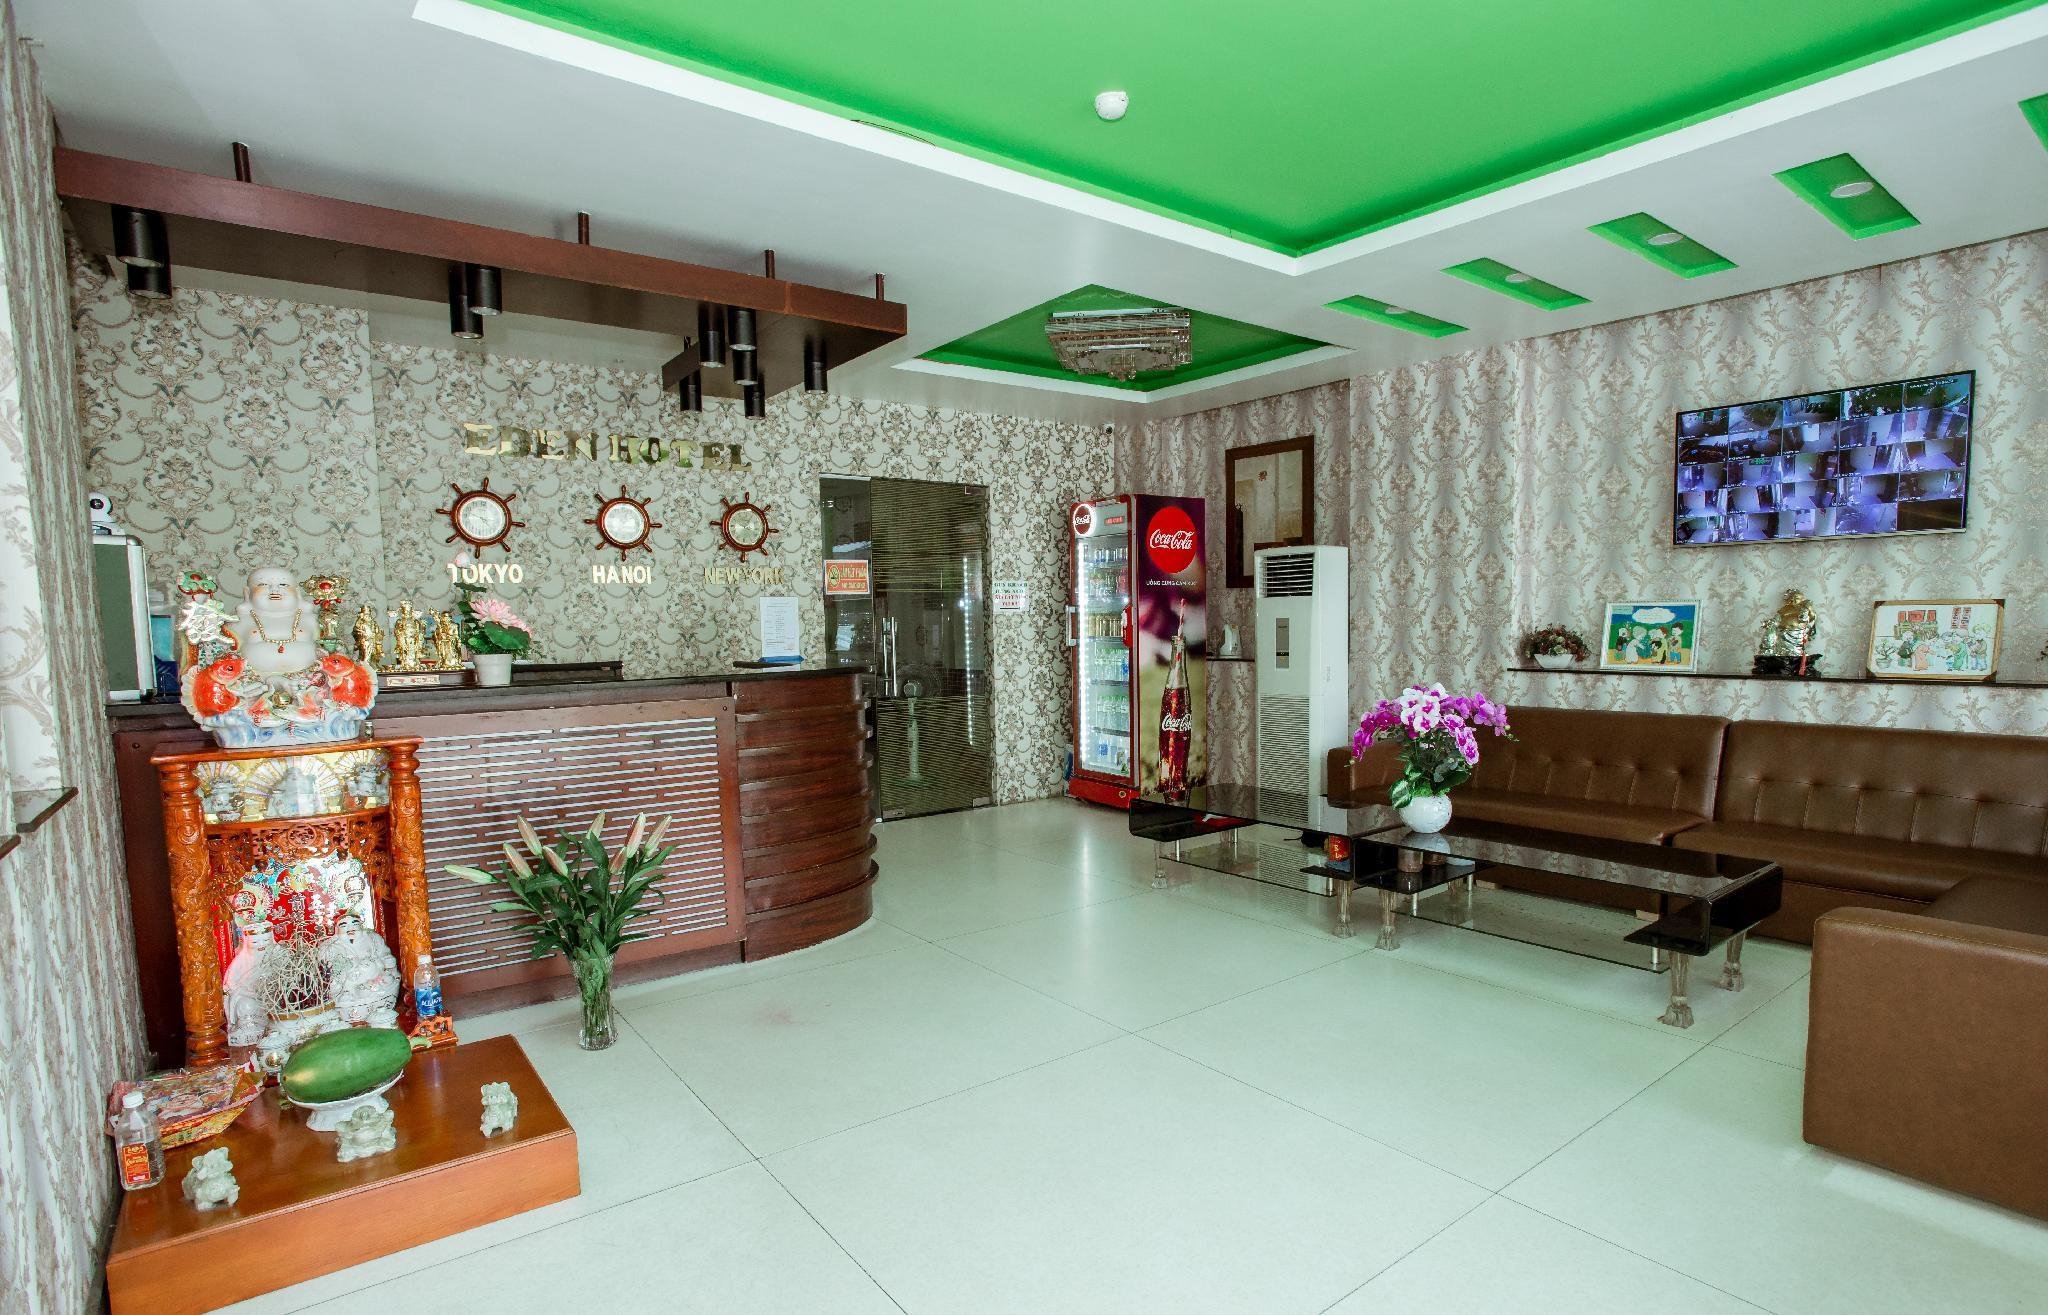 Eden Hotel Sai Gon